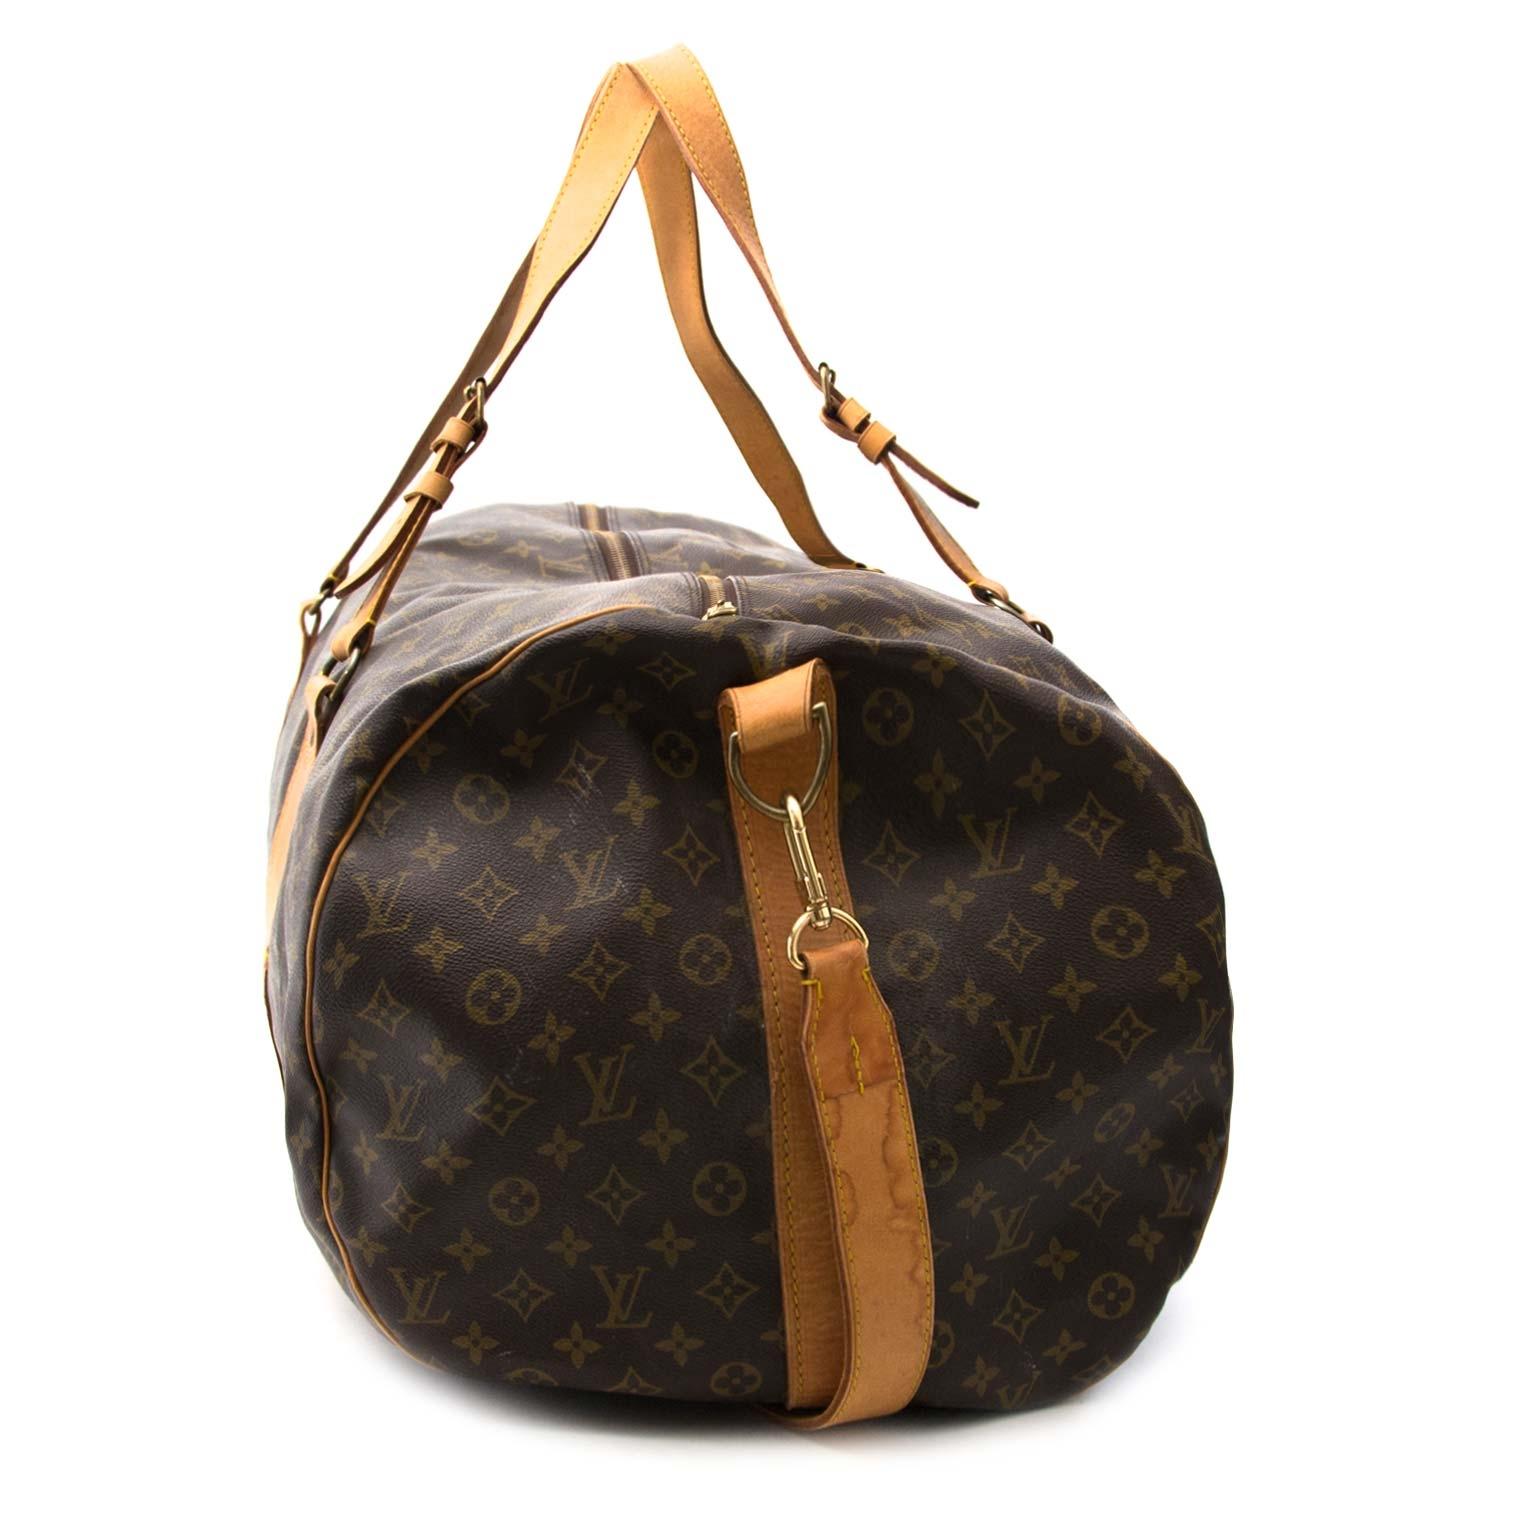 64c898005692 ... shop safe and secure on labellov.com louis vuitton monogram polochon  travel bag for the